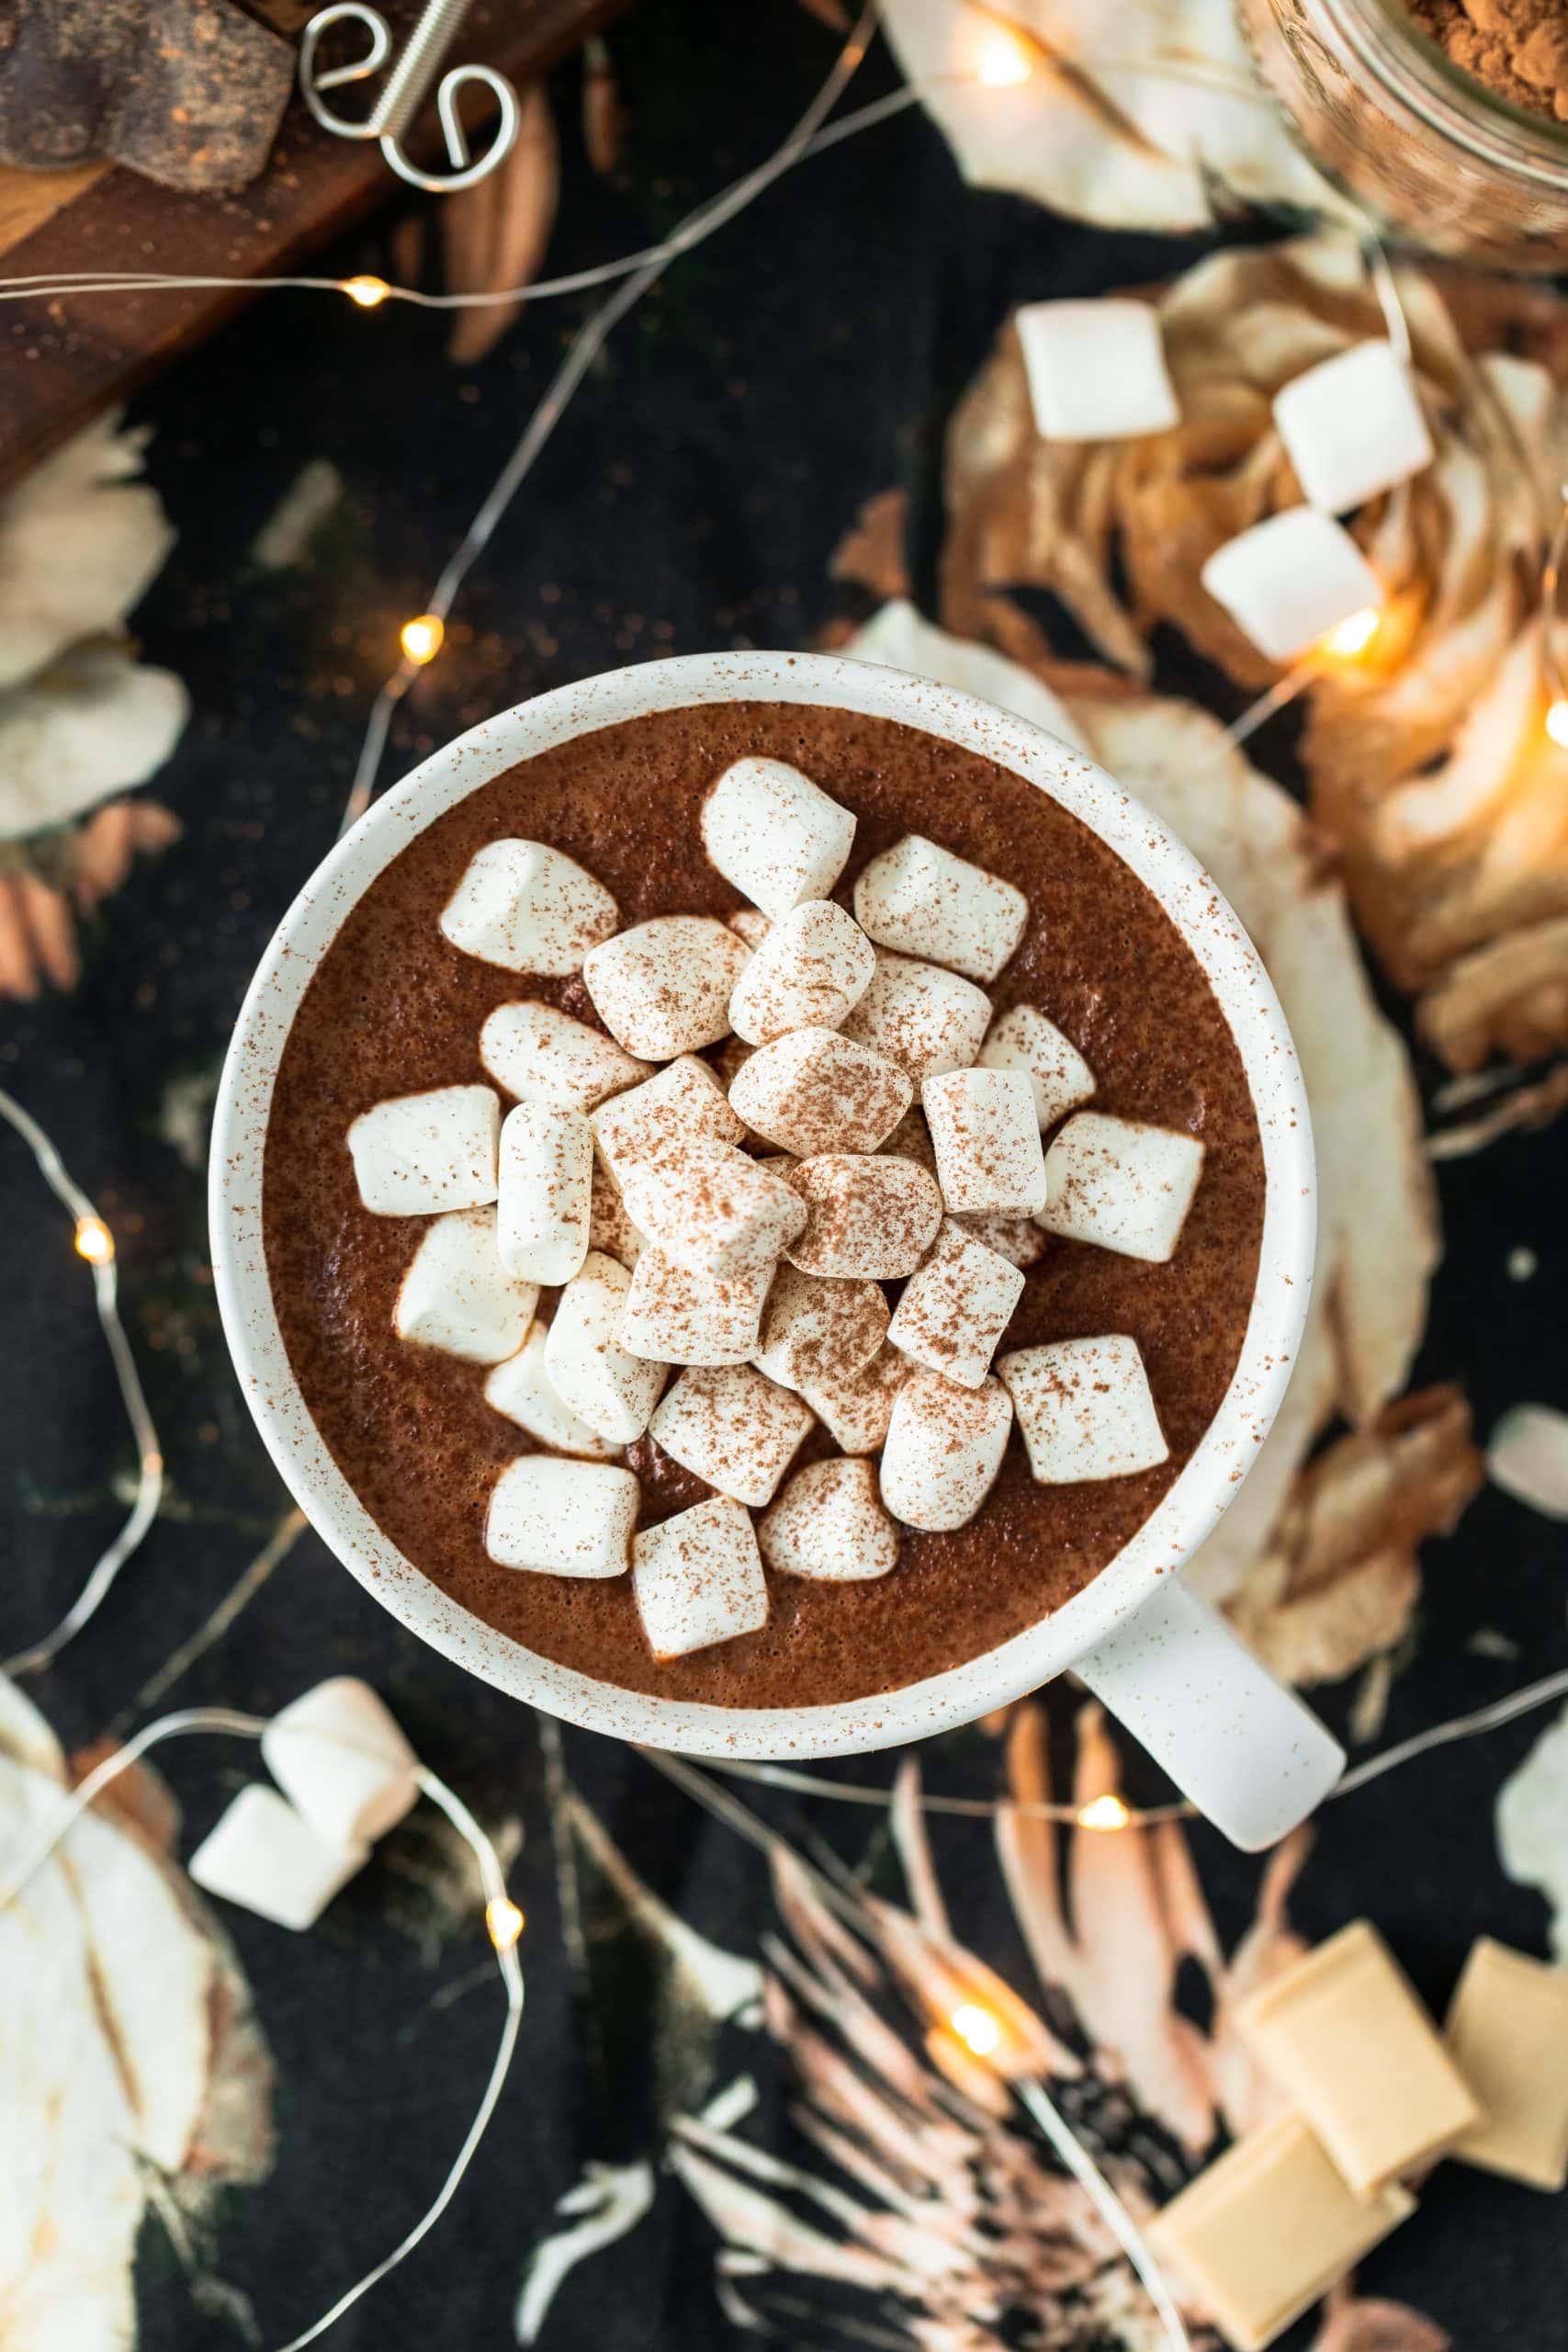 The Best Vegan Chocolate with Vegan Marshmallows